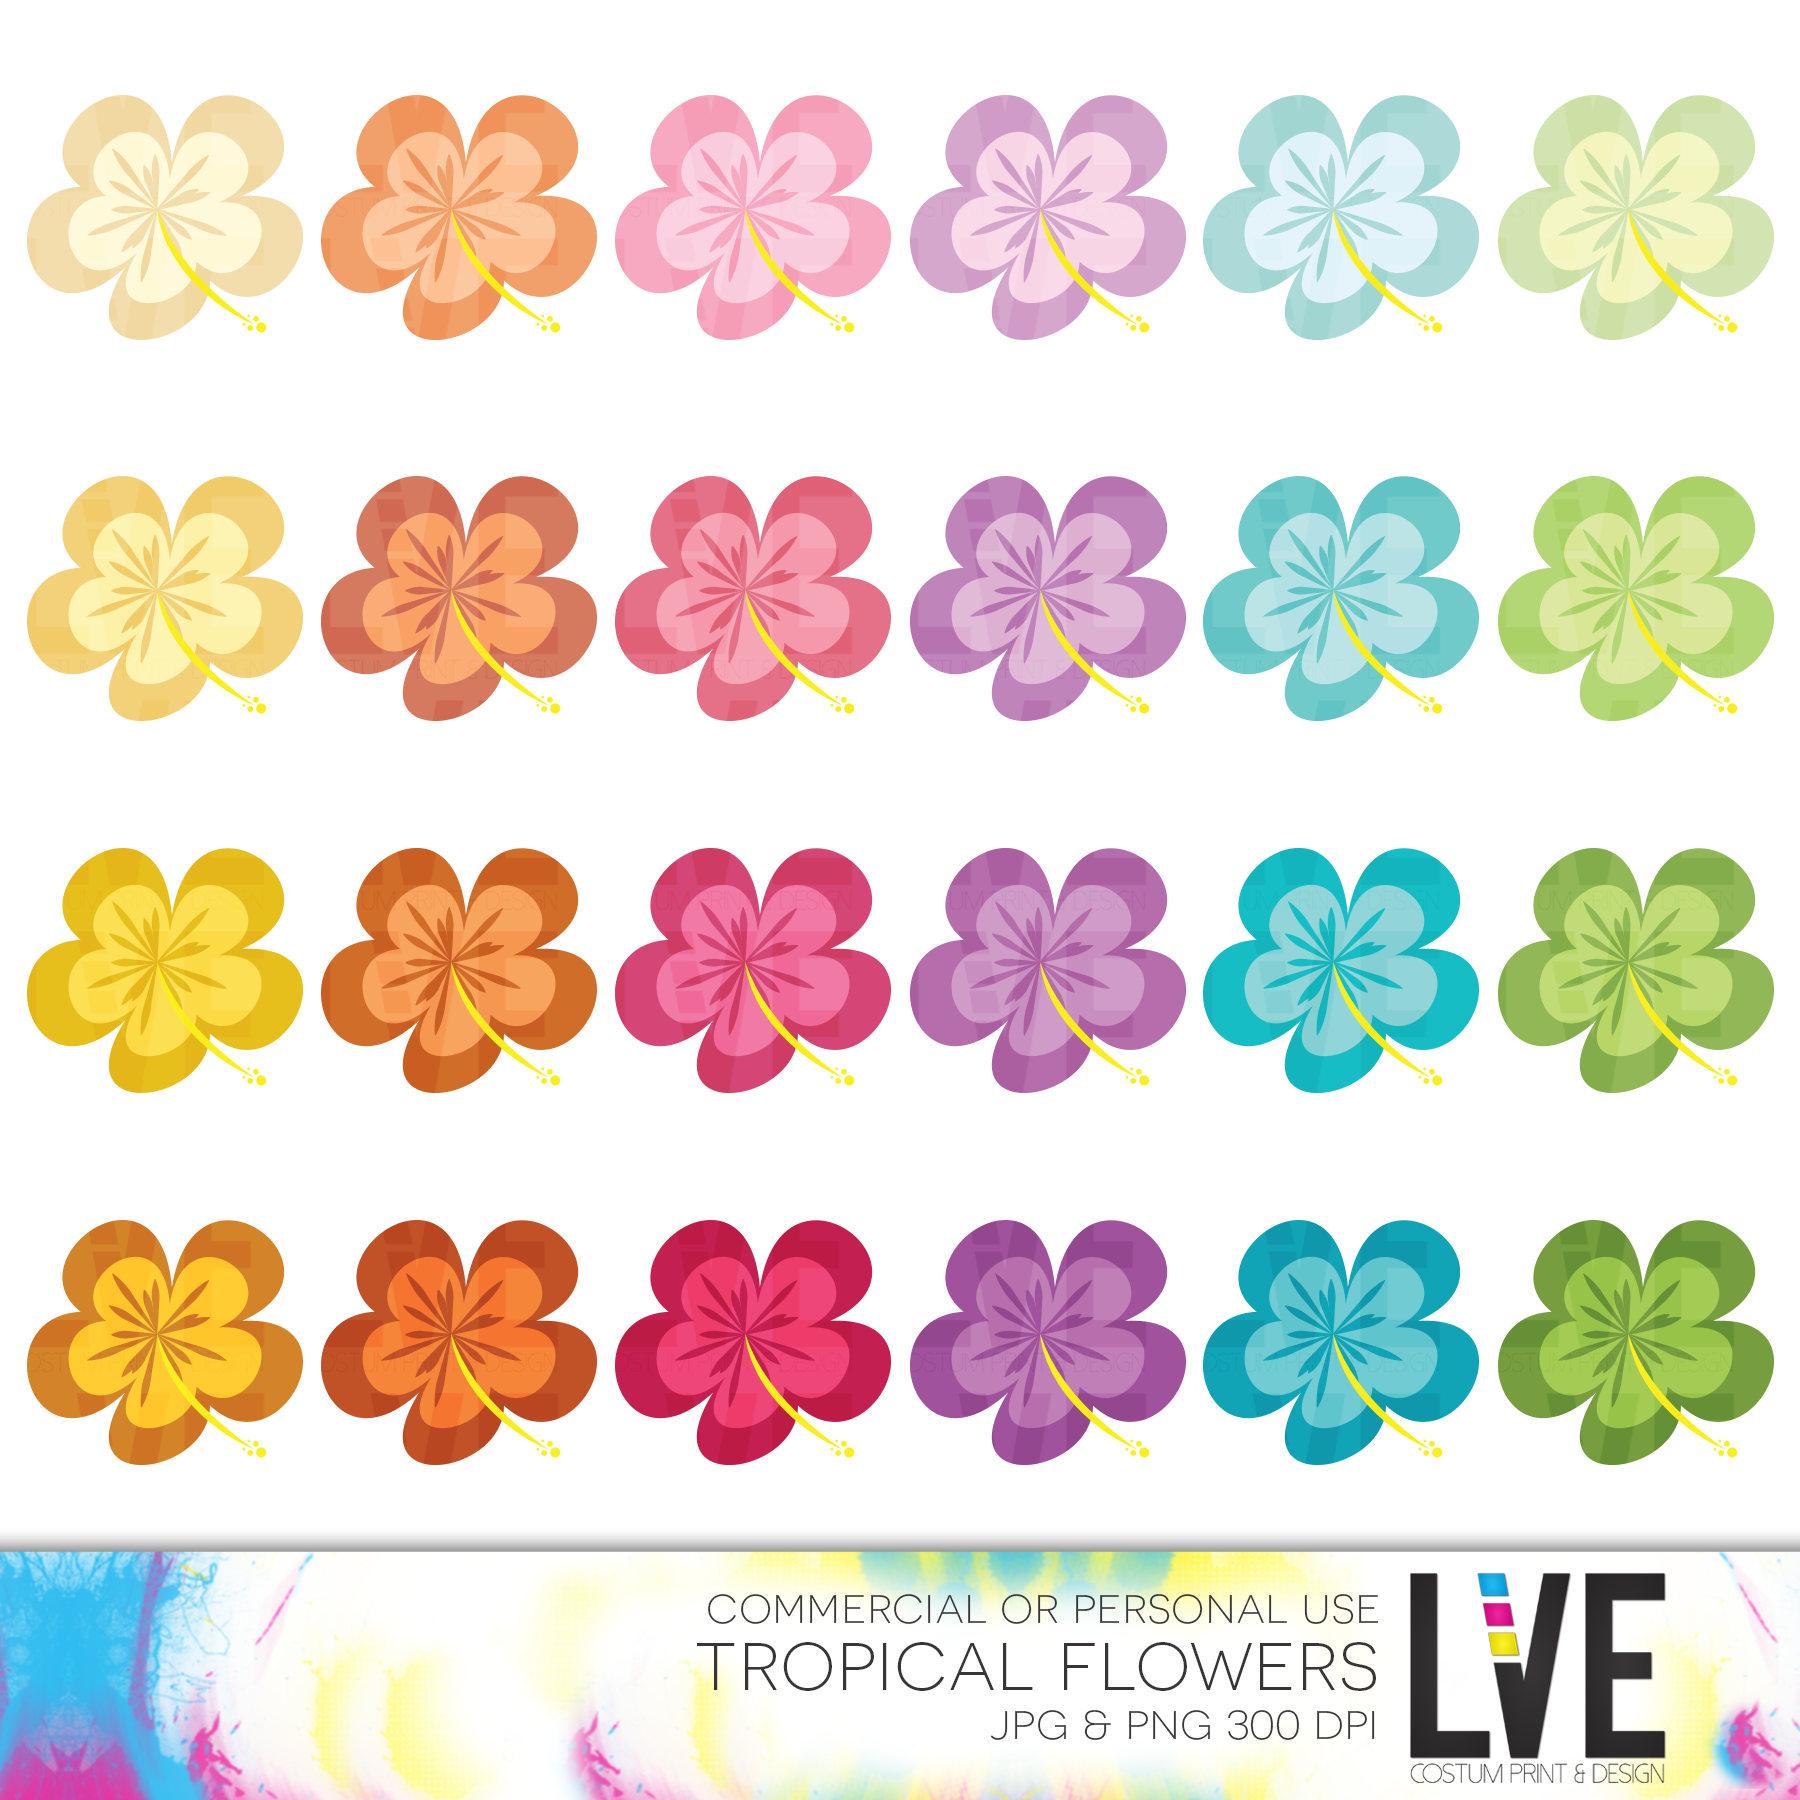 Tropics clipart lei flower #7